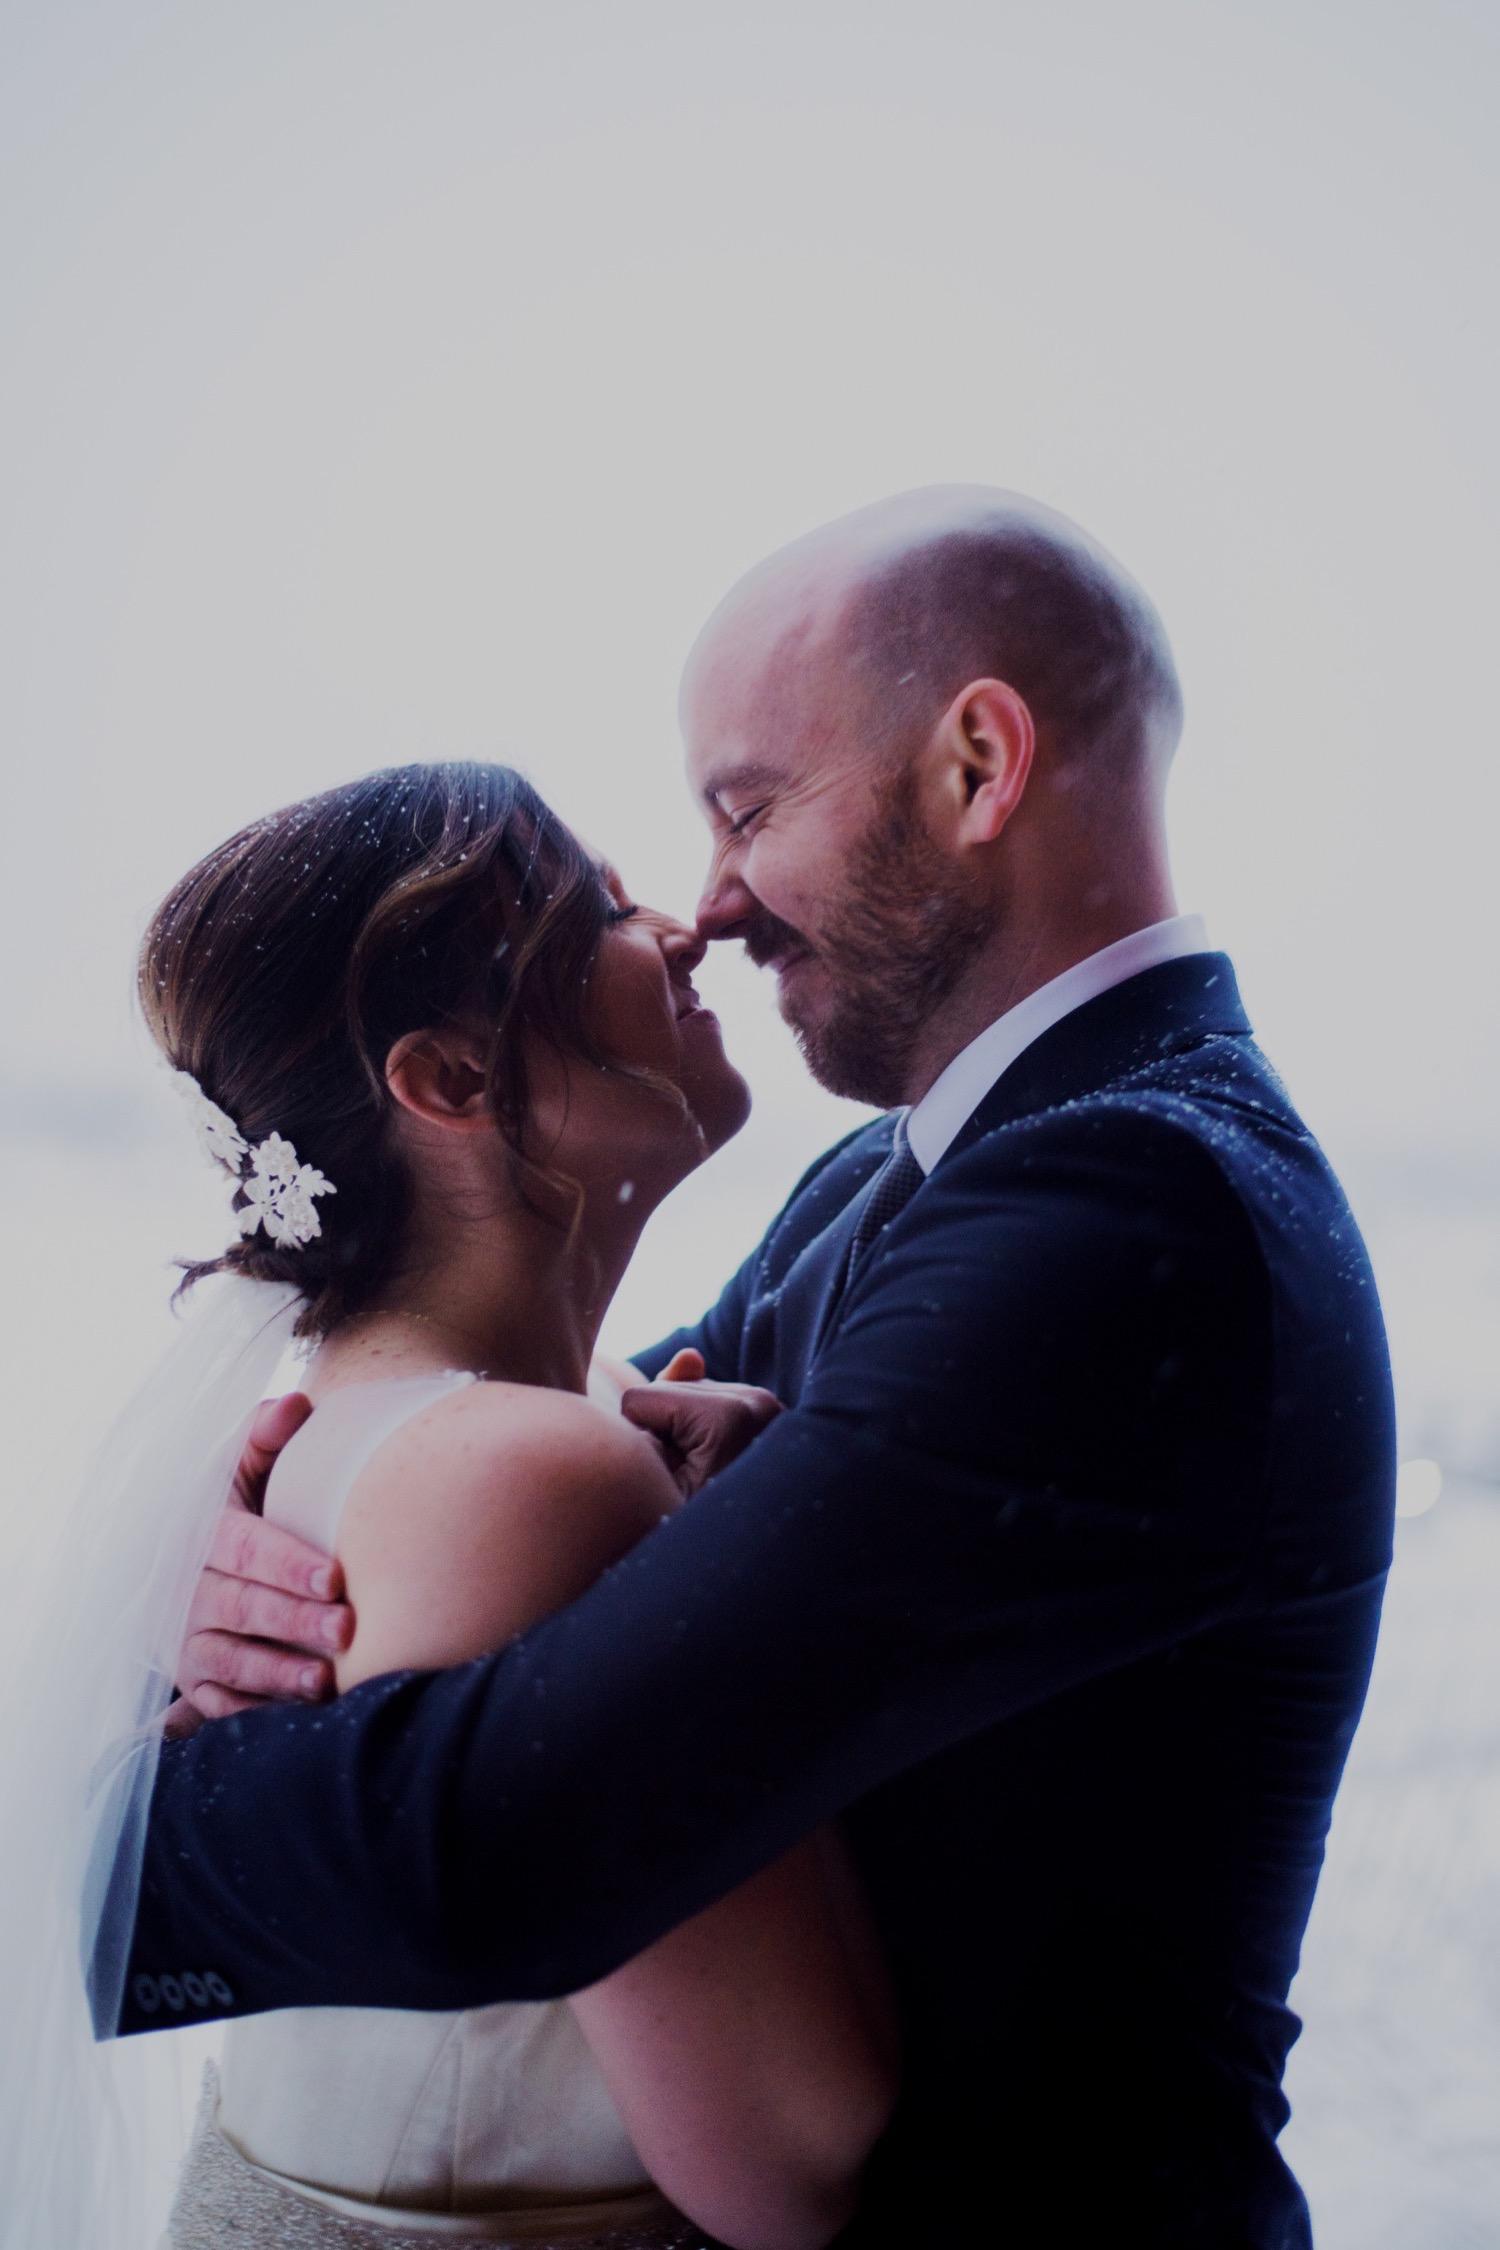 068_McGrath-Libertyville-IndependenceGrove-Winter-Wedding_0097_Independencegrovewedding.jpg